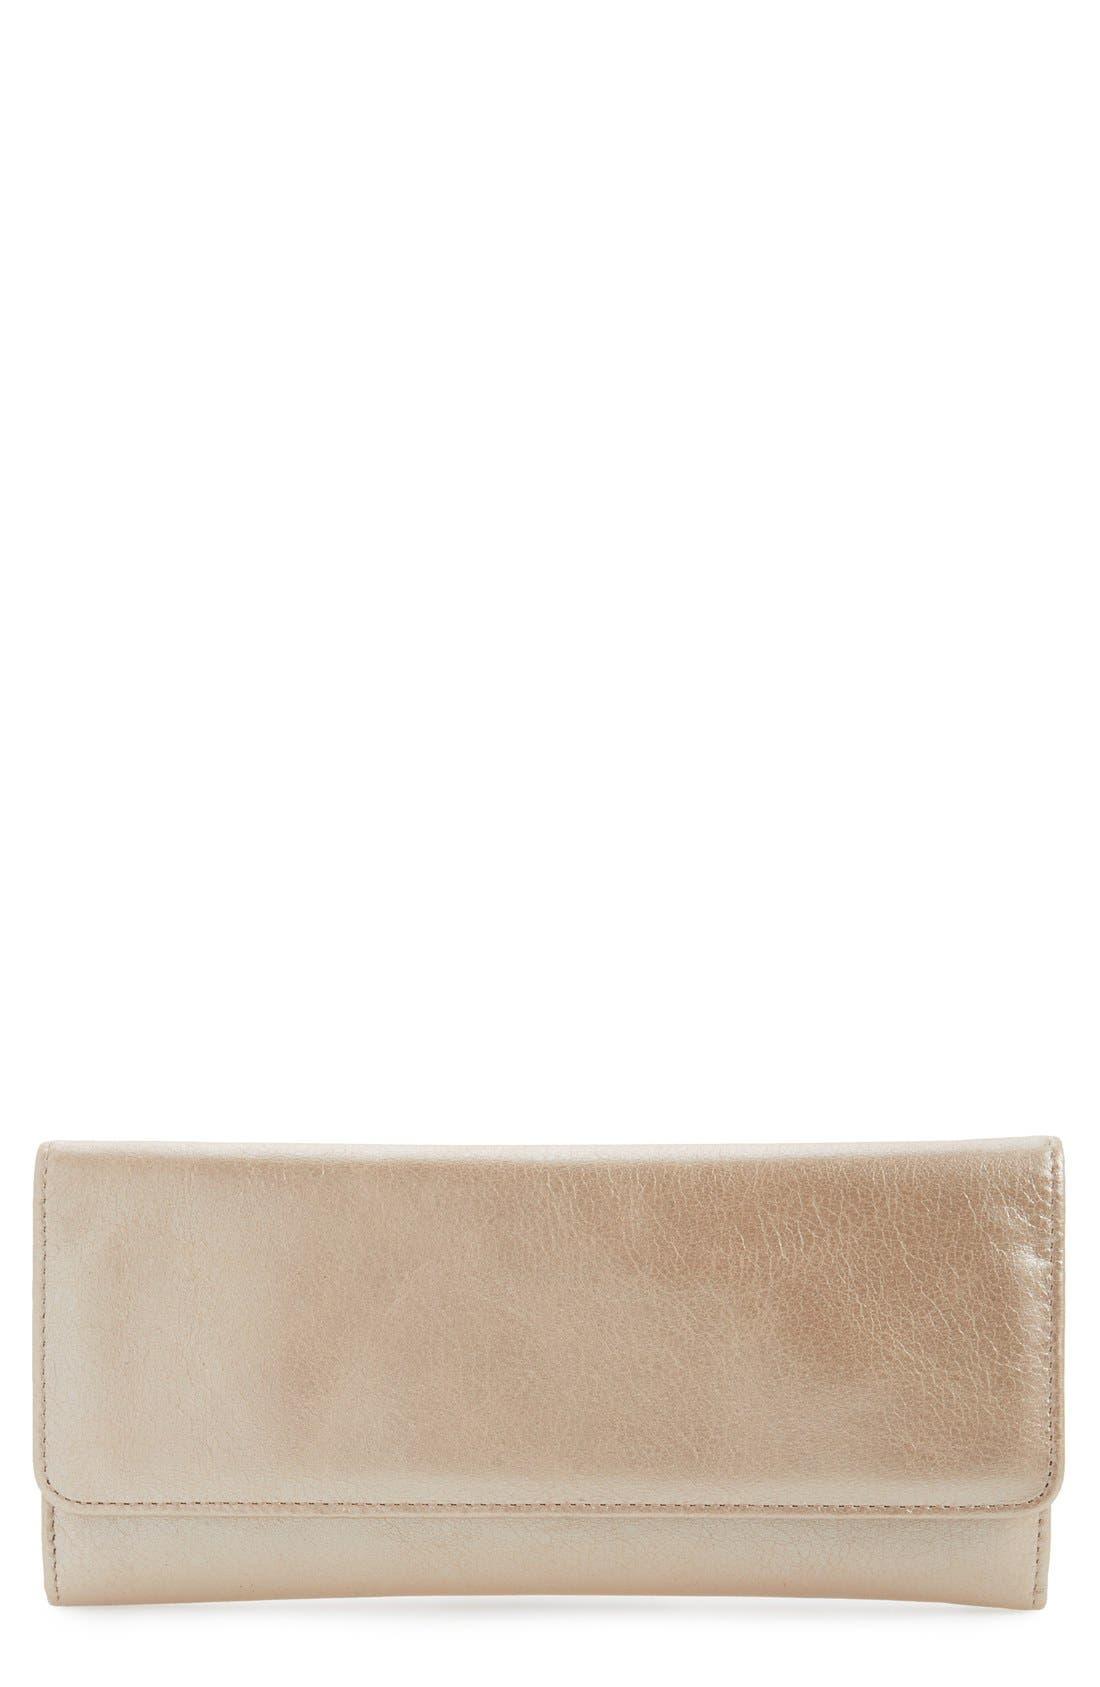 'Sadie' Leather Wallet,                             Main thumbnail 33, color,